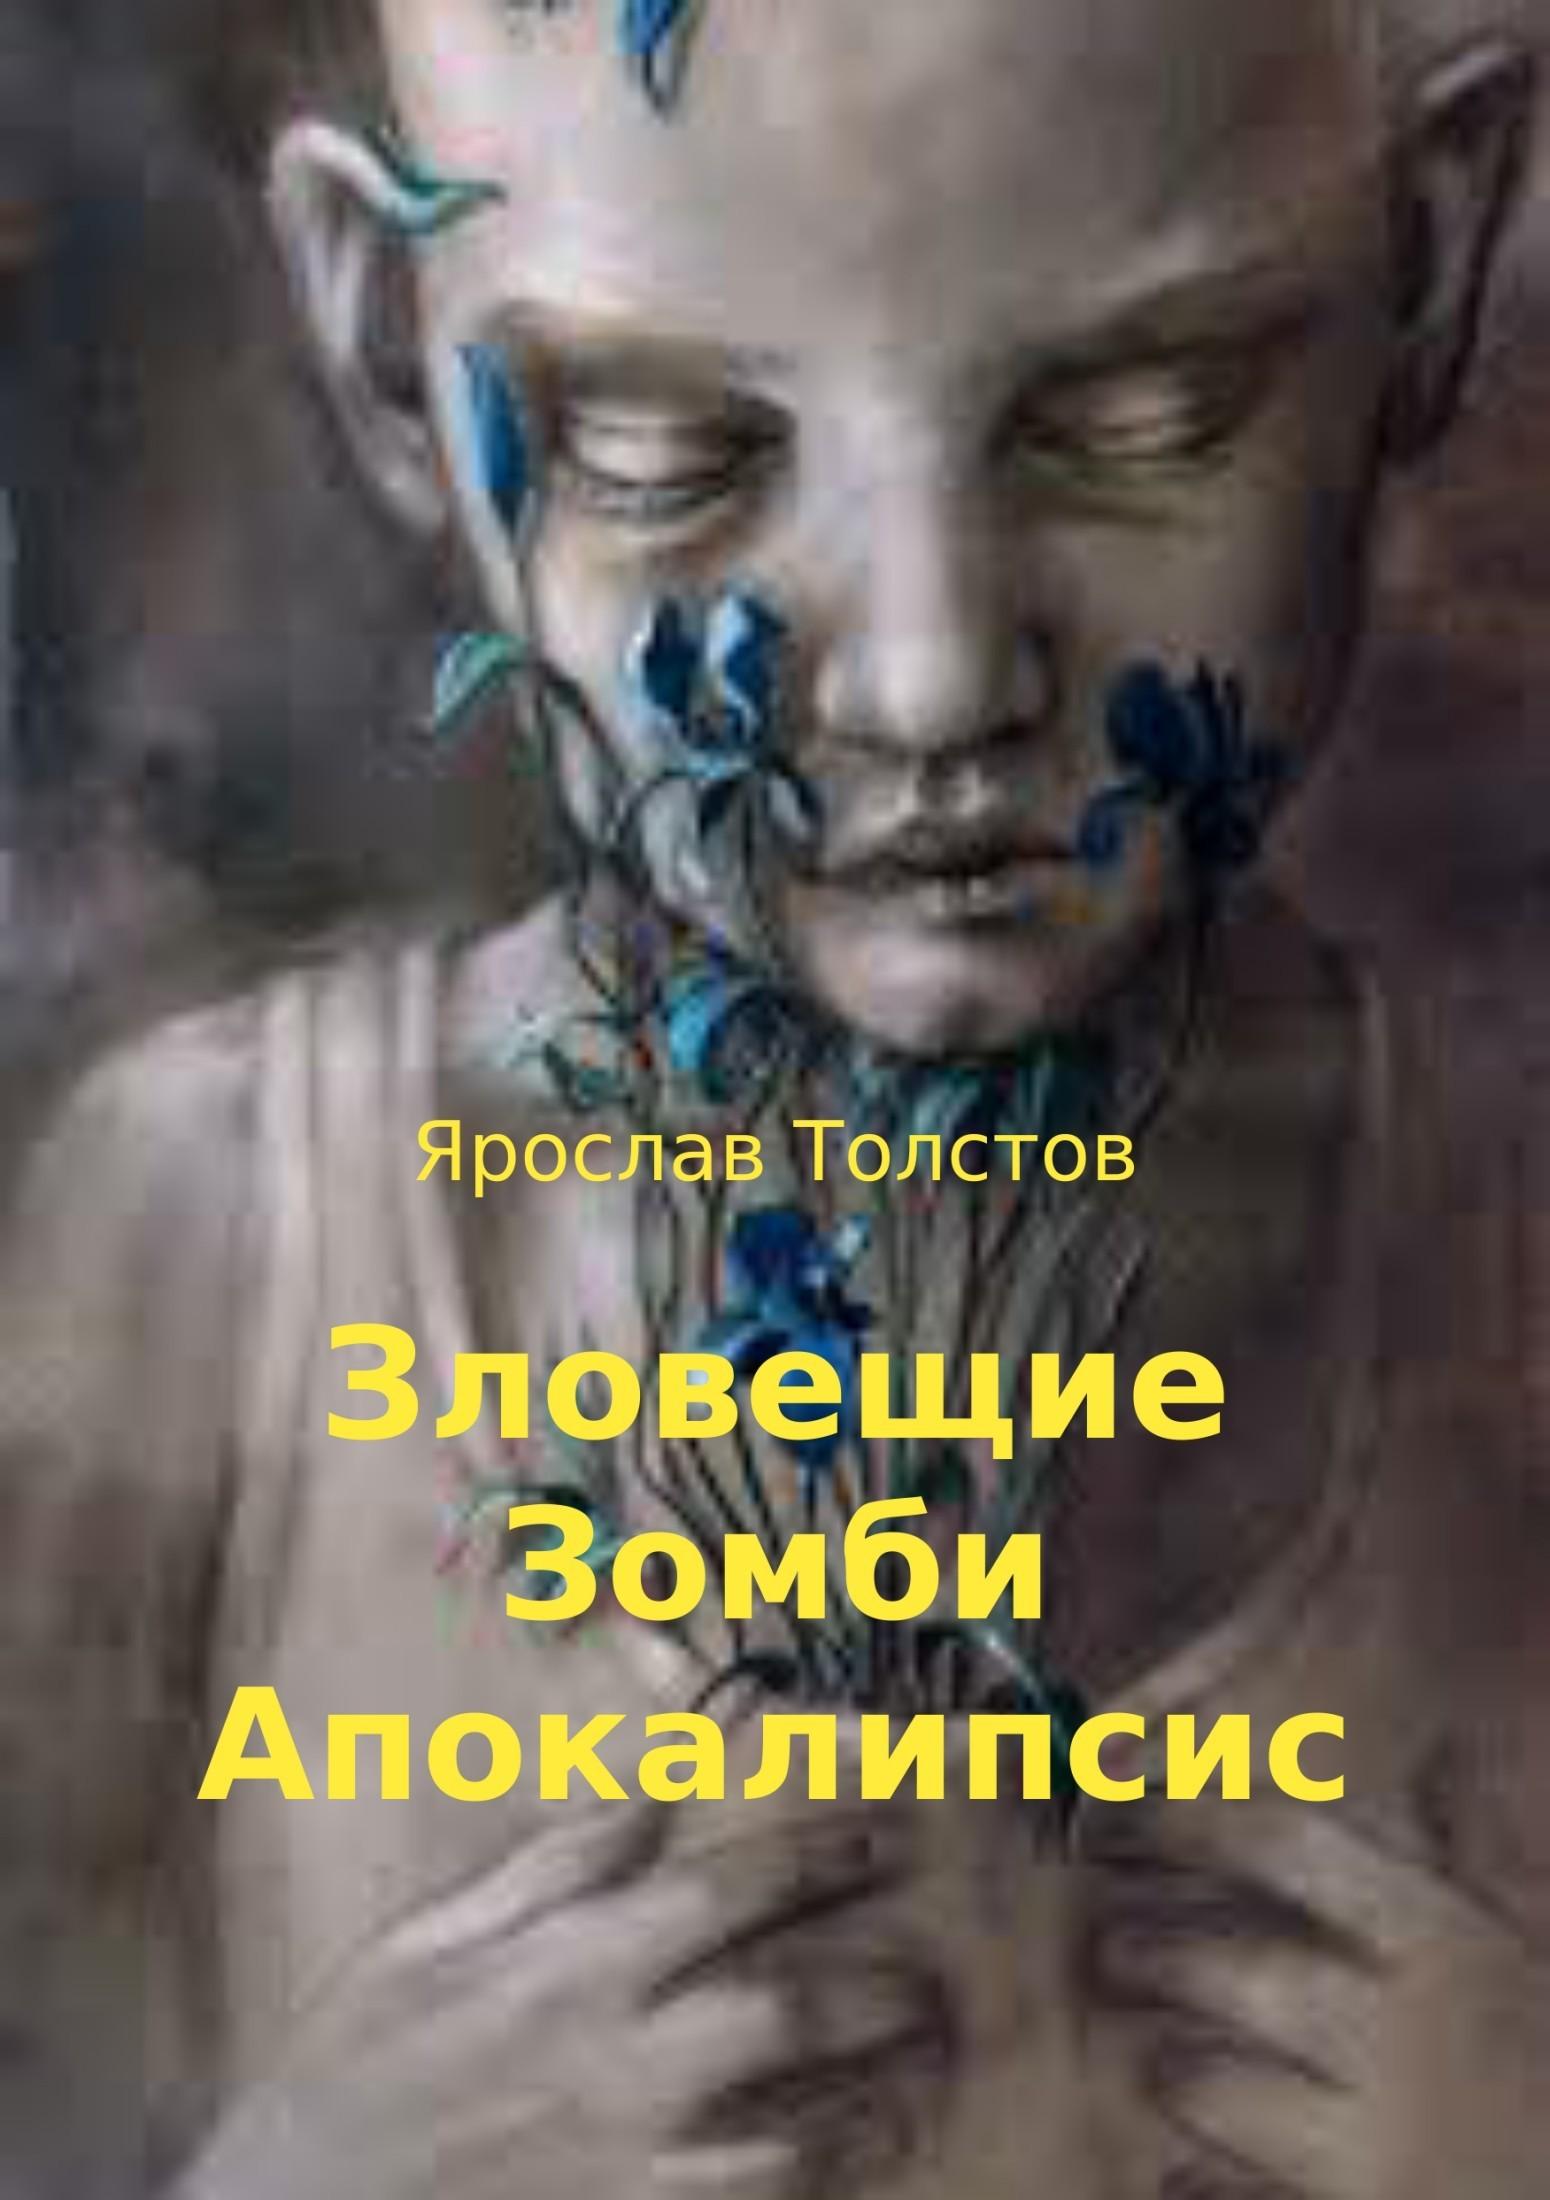 Зловещие Зомби Апокалипсис